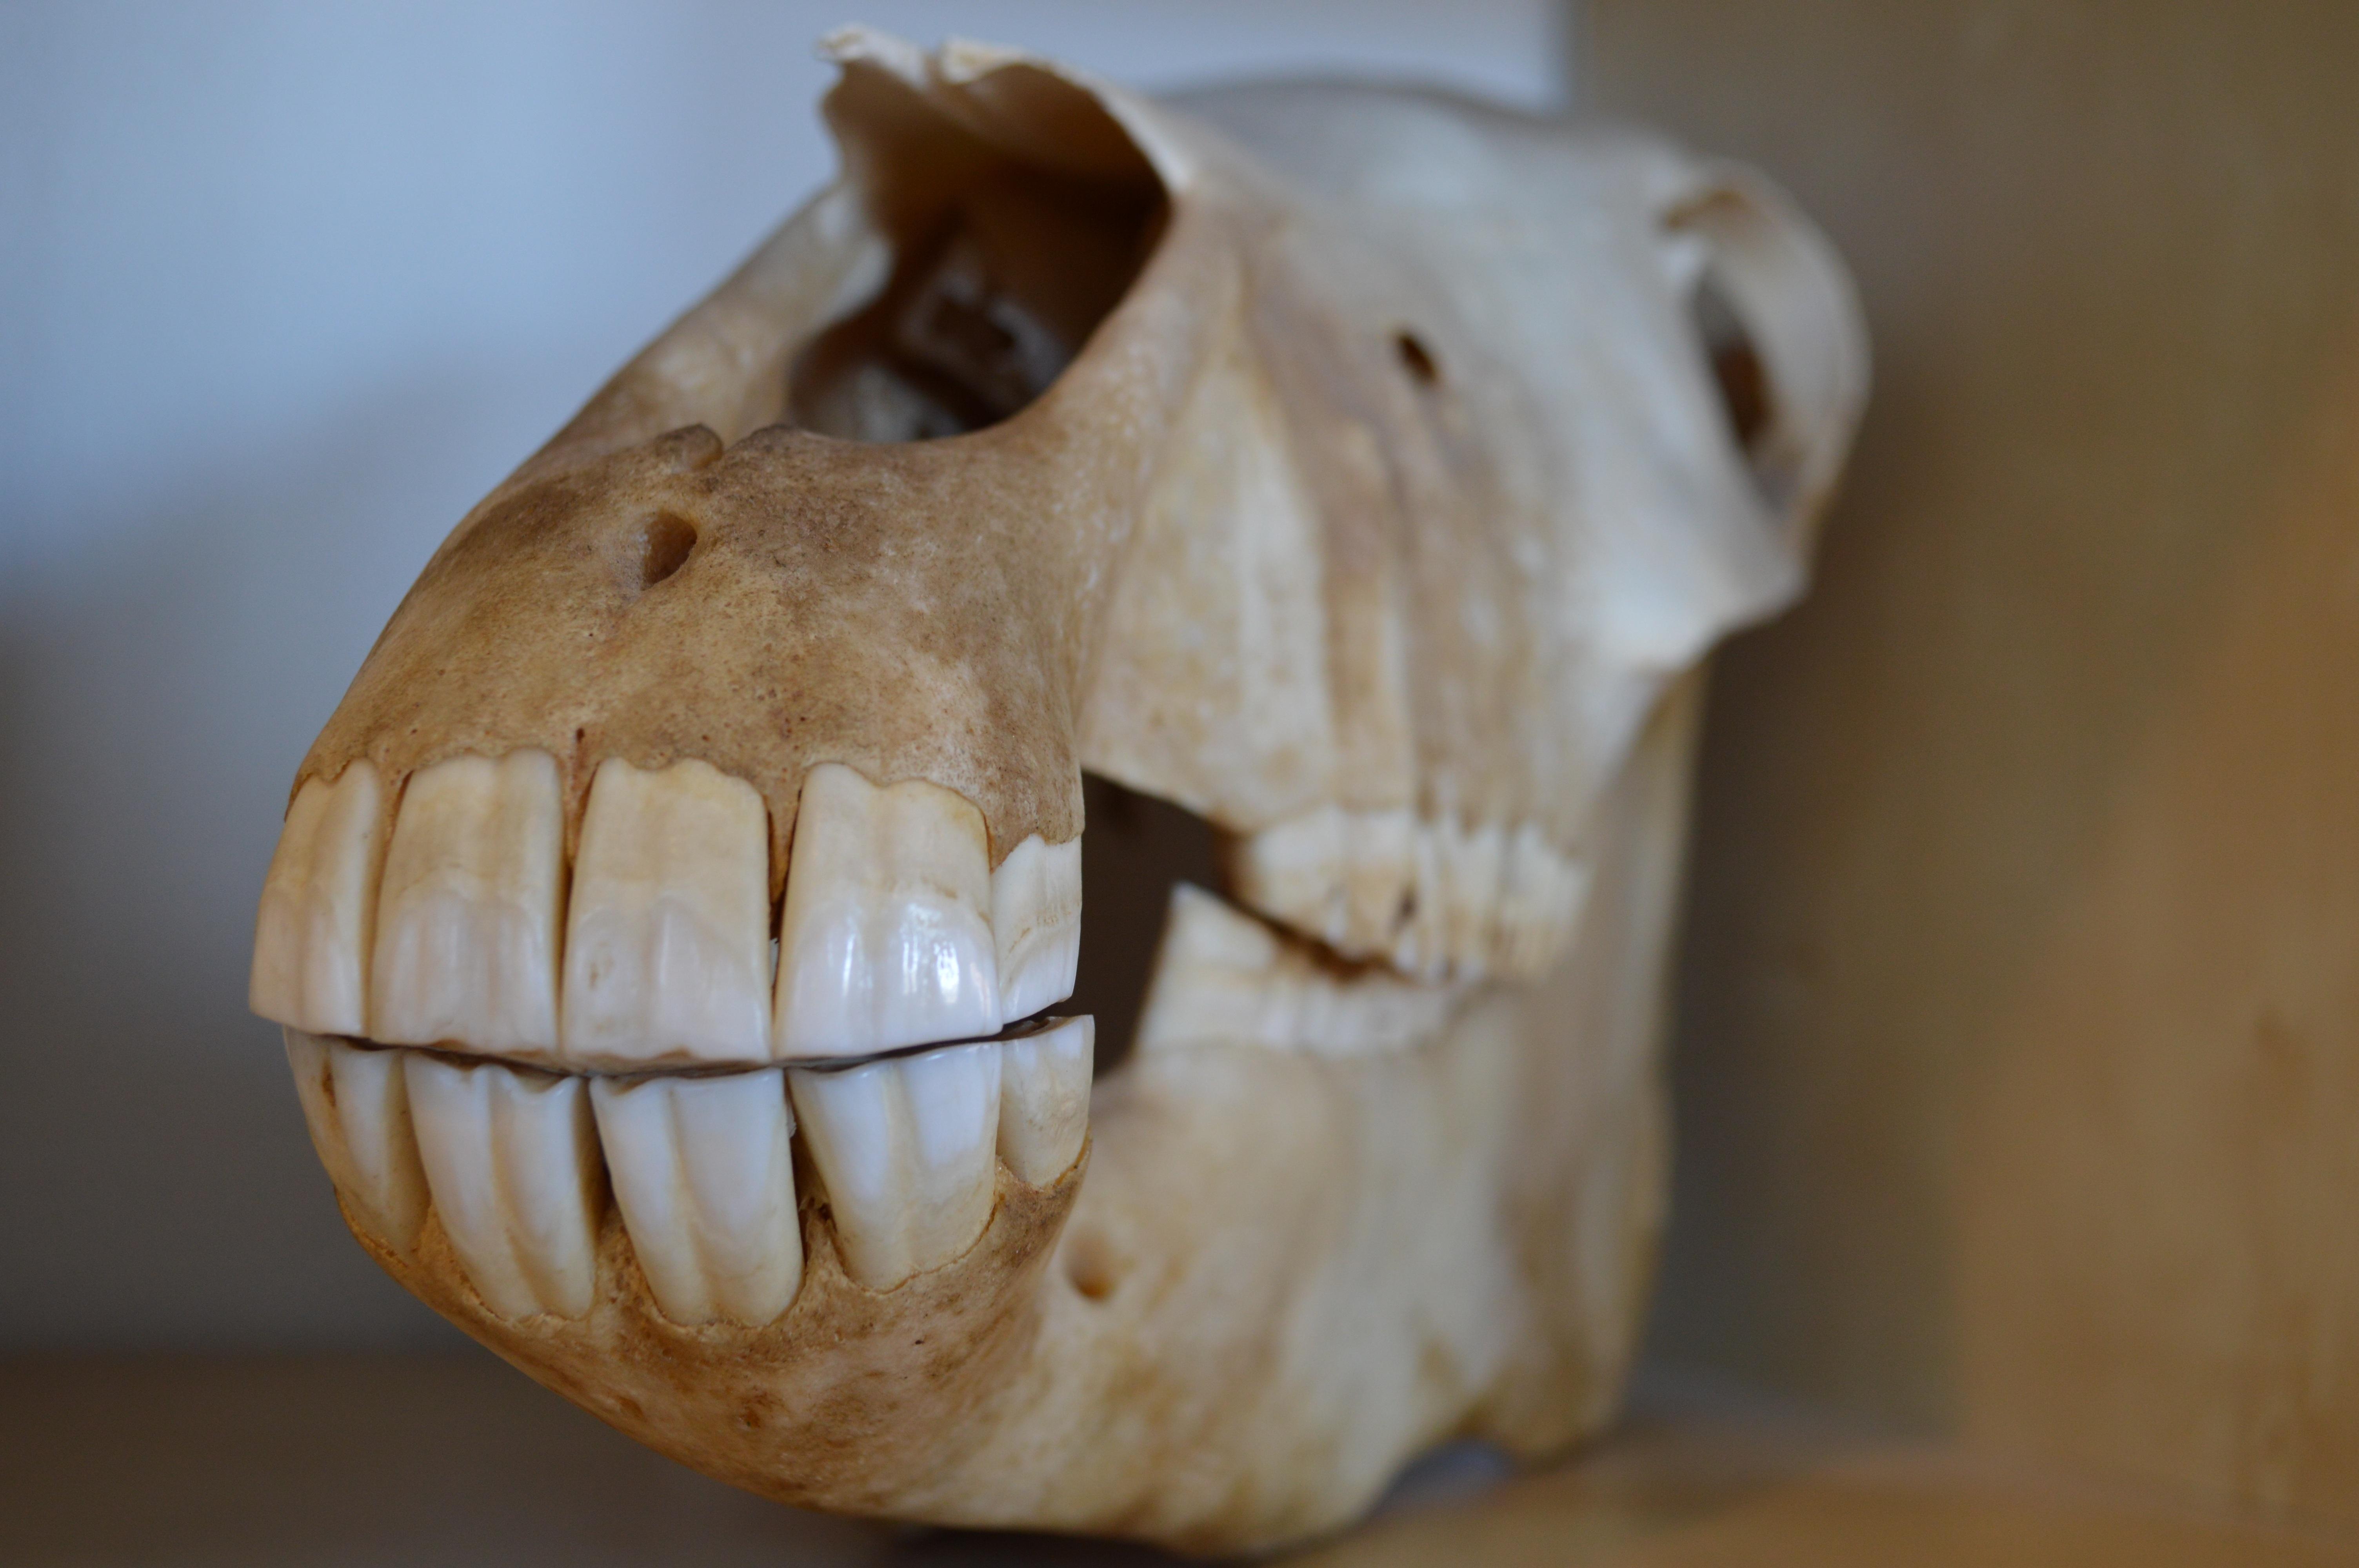 Free Images : wood, food, produce, horse, ceramic, death, skull ...